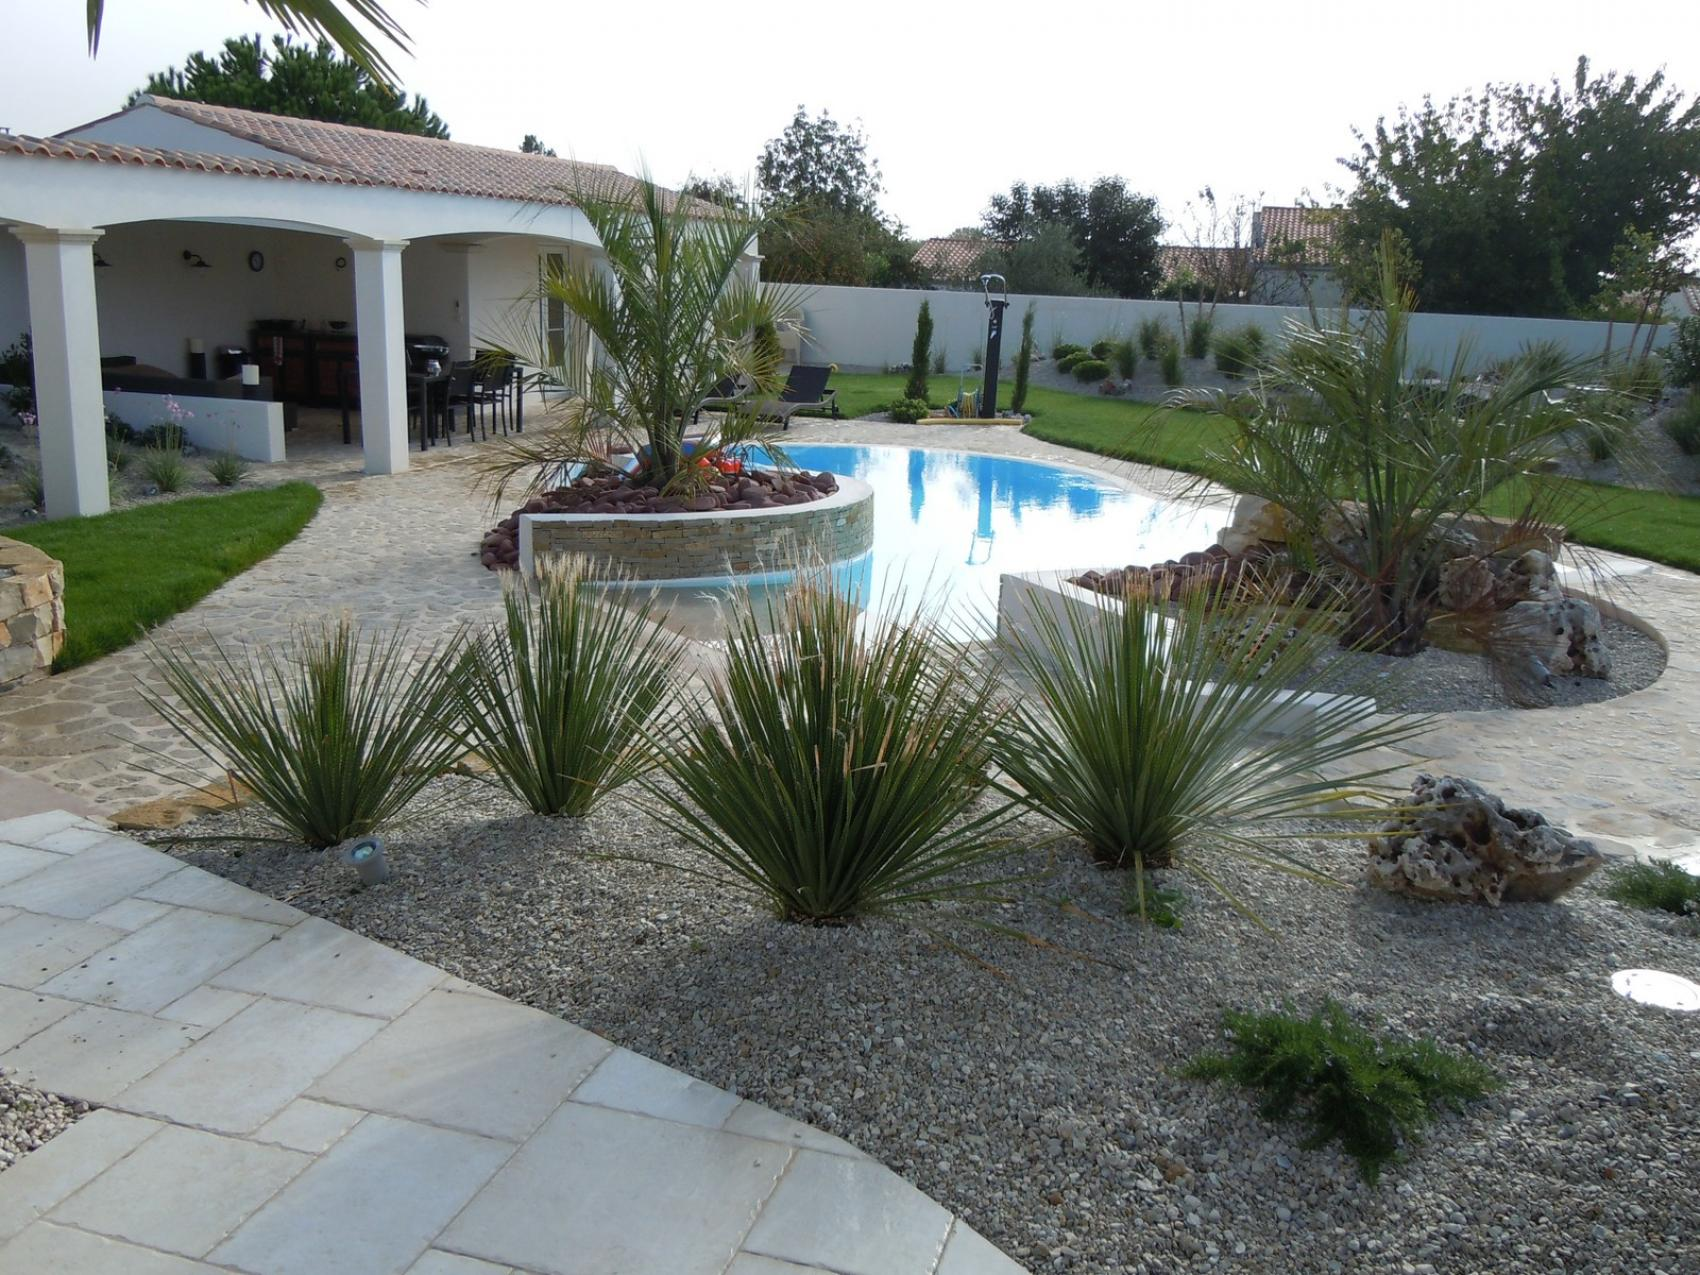 aydin constructeur piscine la rochelle nous contacter. Black Bedroom Furniture Sets. Home Design Ideas